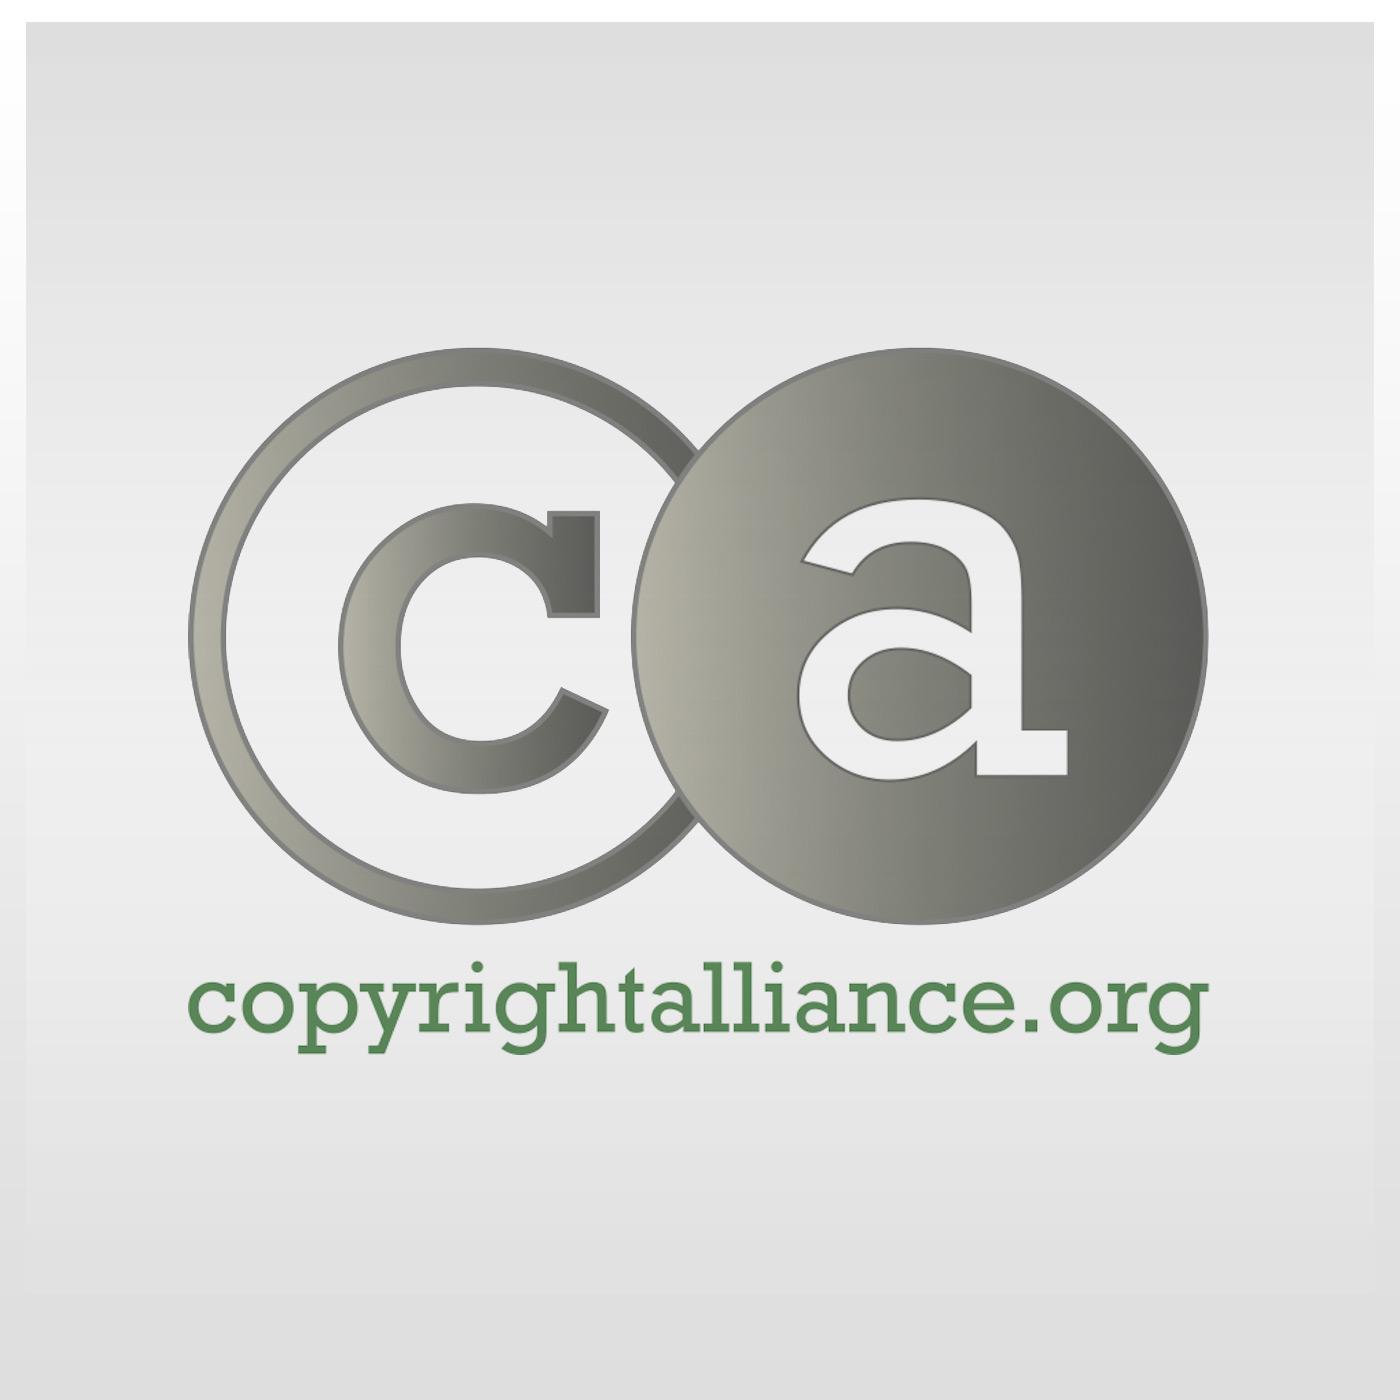 Copyright Alliance's Podcast logo